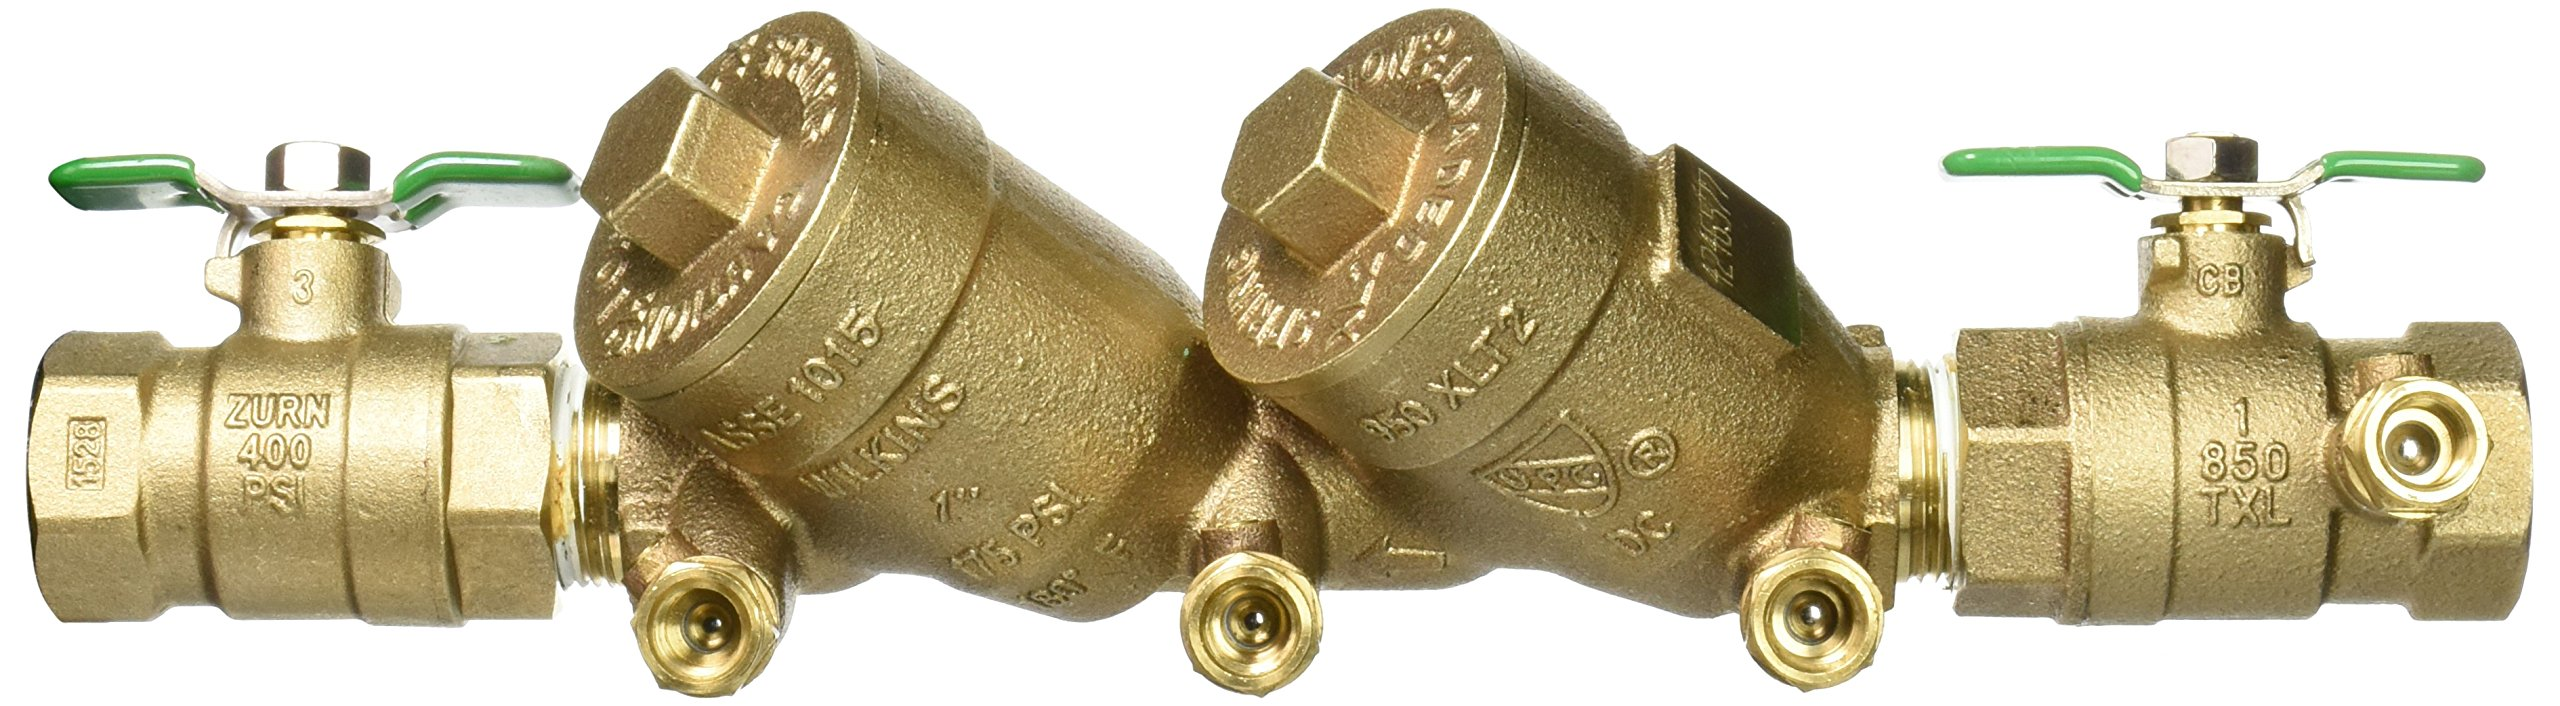 Zurn 1-950XLT2 Wilkins Double Check Valve Backflow Preventer 1'' Lead Free by Zurn (Image #5)